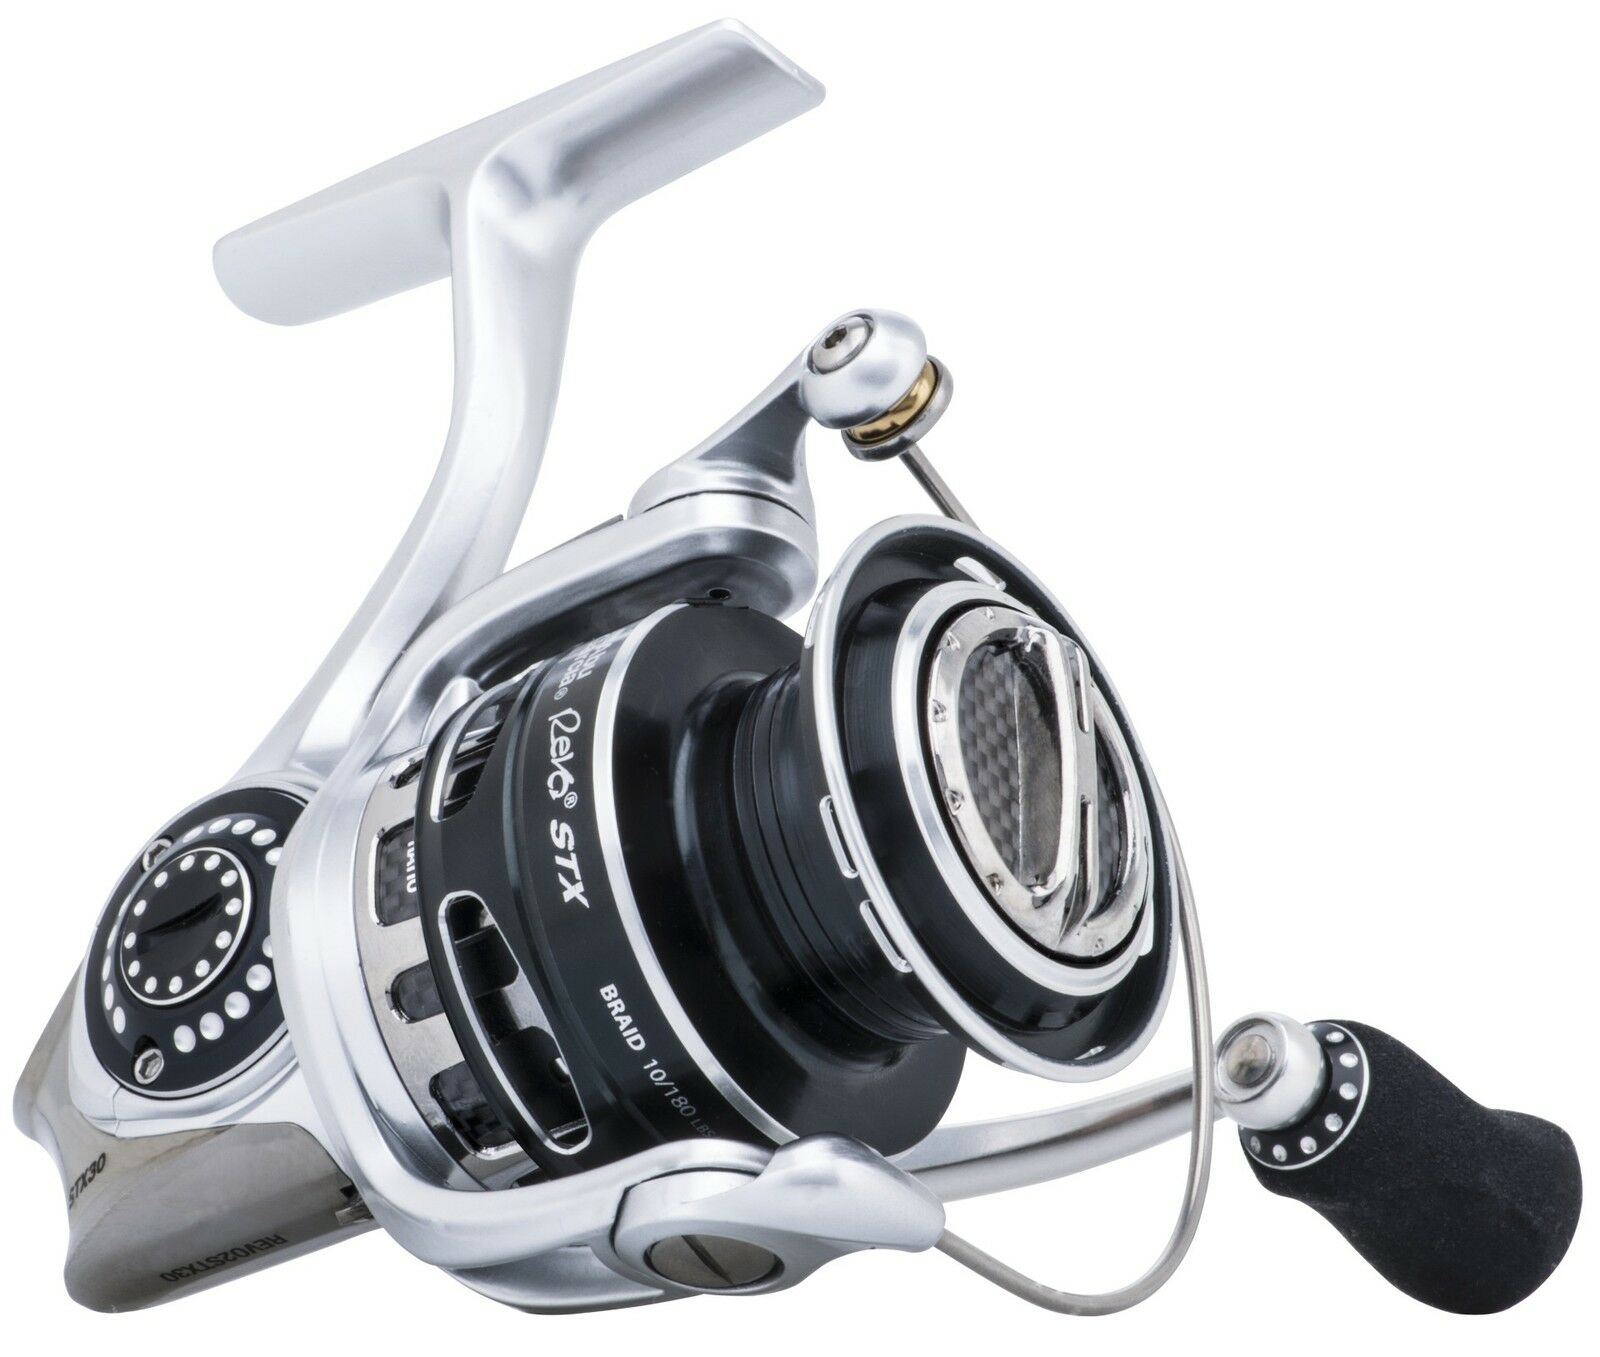 ABU GARCIA GARCIA GARCIA REVO STX SPIN - Größes  10 20 30 40 - Ultimate Spinning 15610b